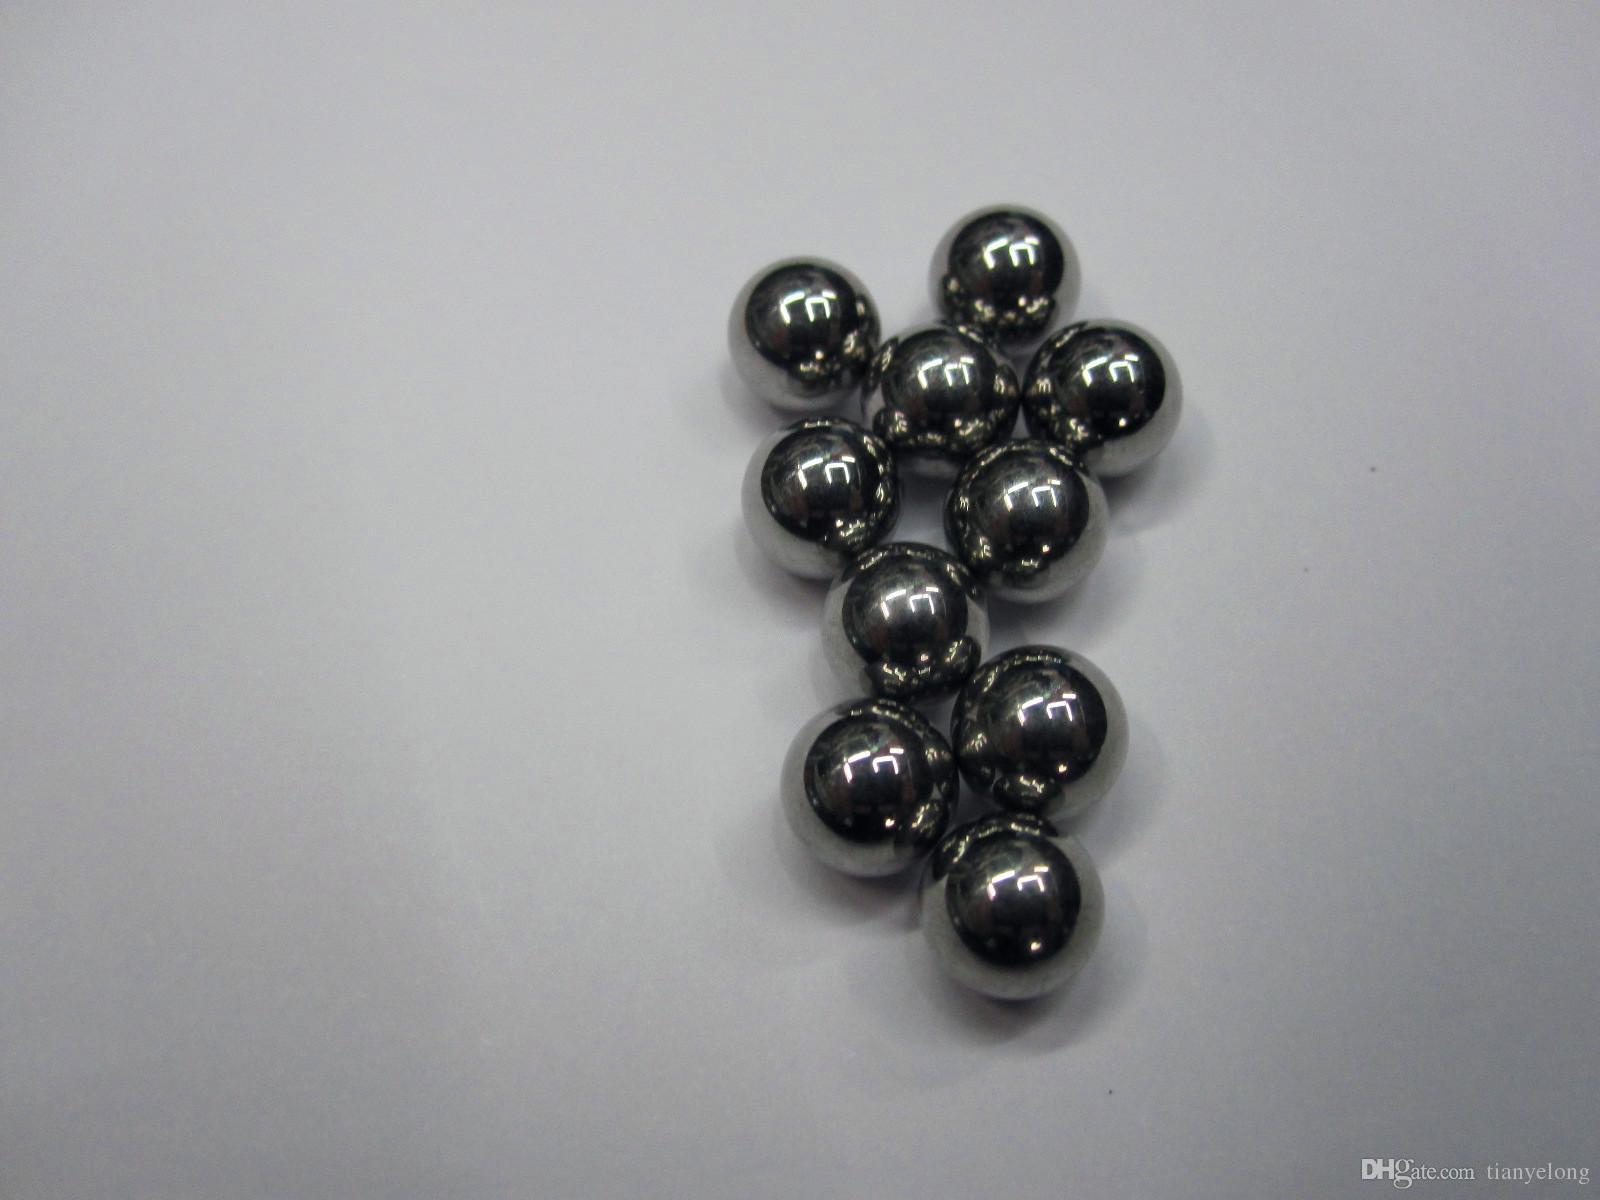 6.5MM Chromstahl Kugellager Ball Stahlkugel Durchmesser 6.5 mm / set Precision: G10-Grade